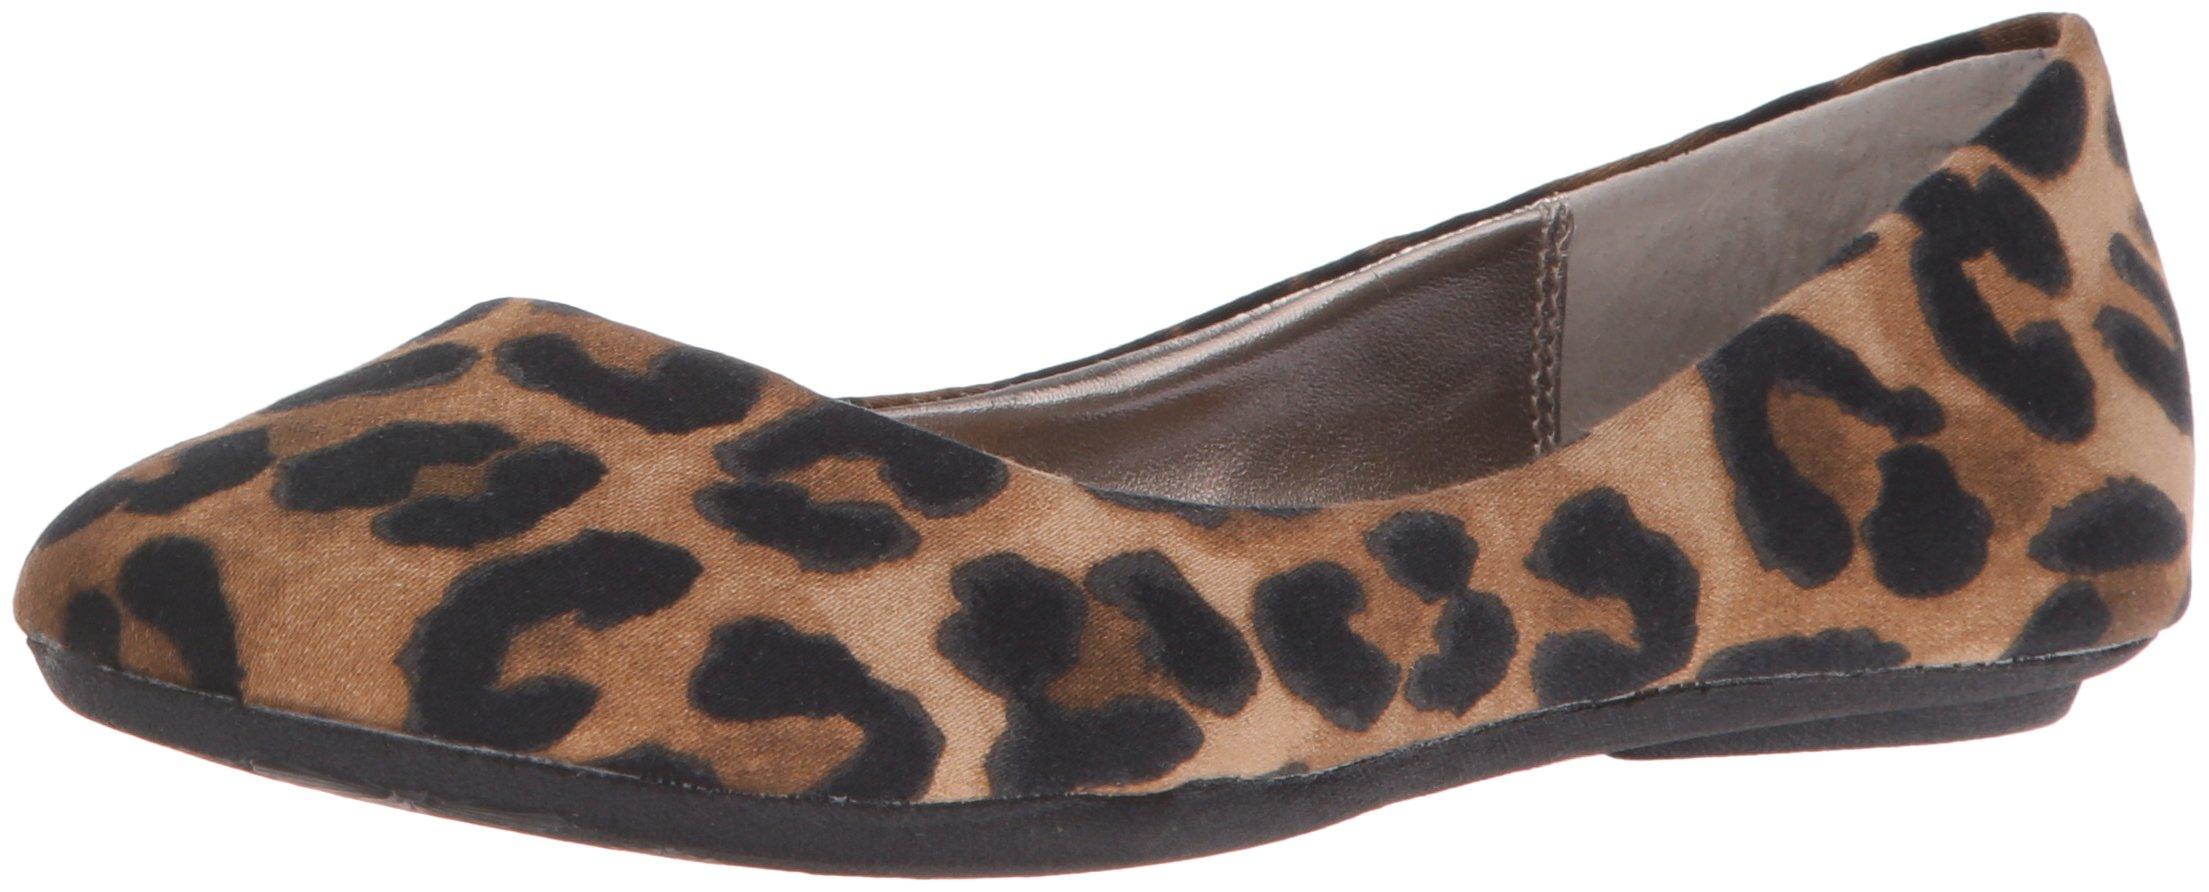 Steve Madden Women's P-Heaven Flat,Leopard Fabric,8 M US